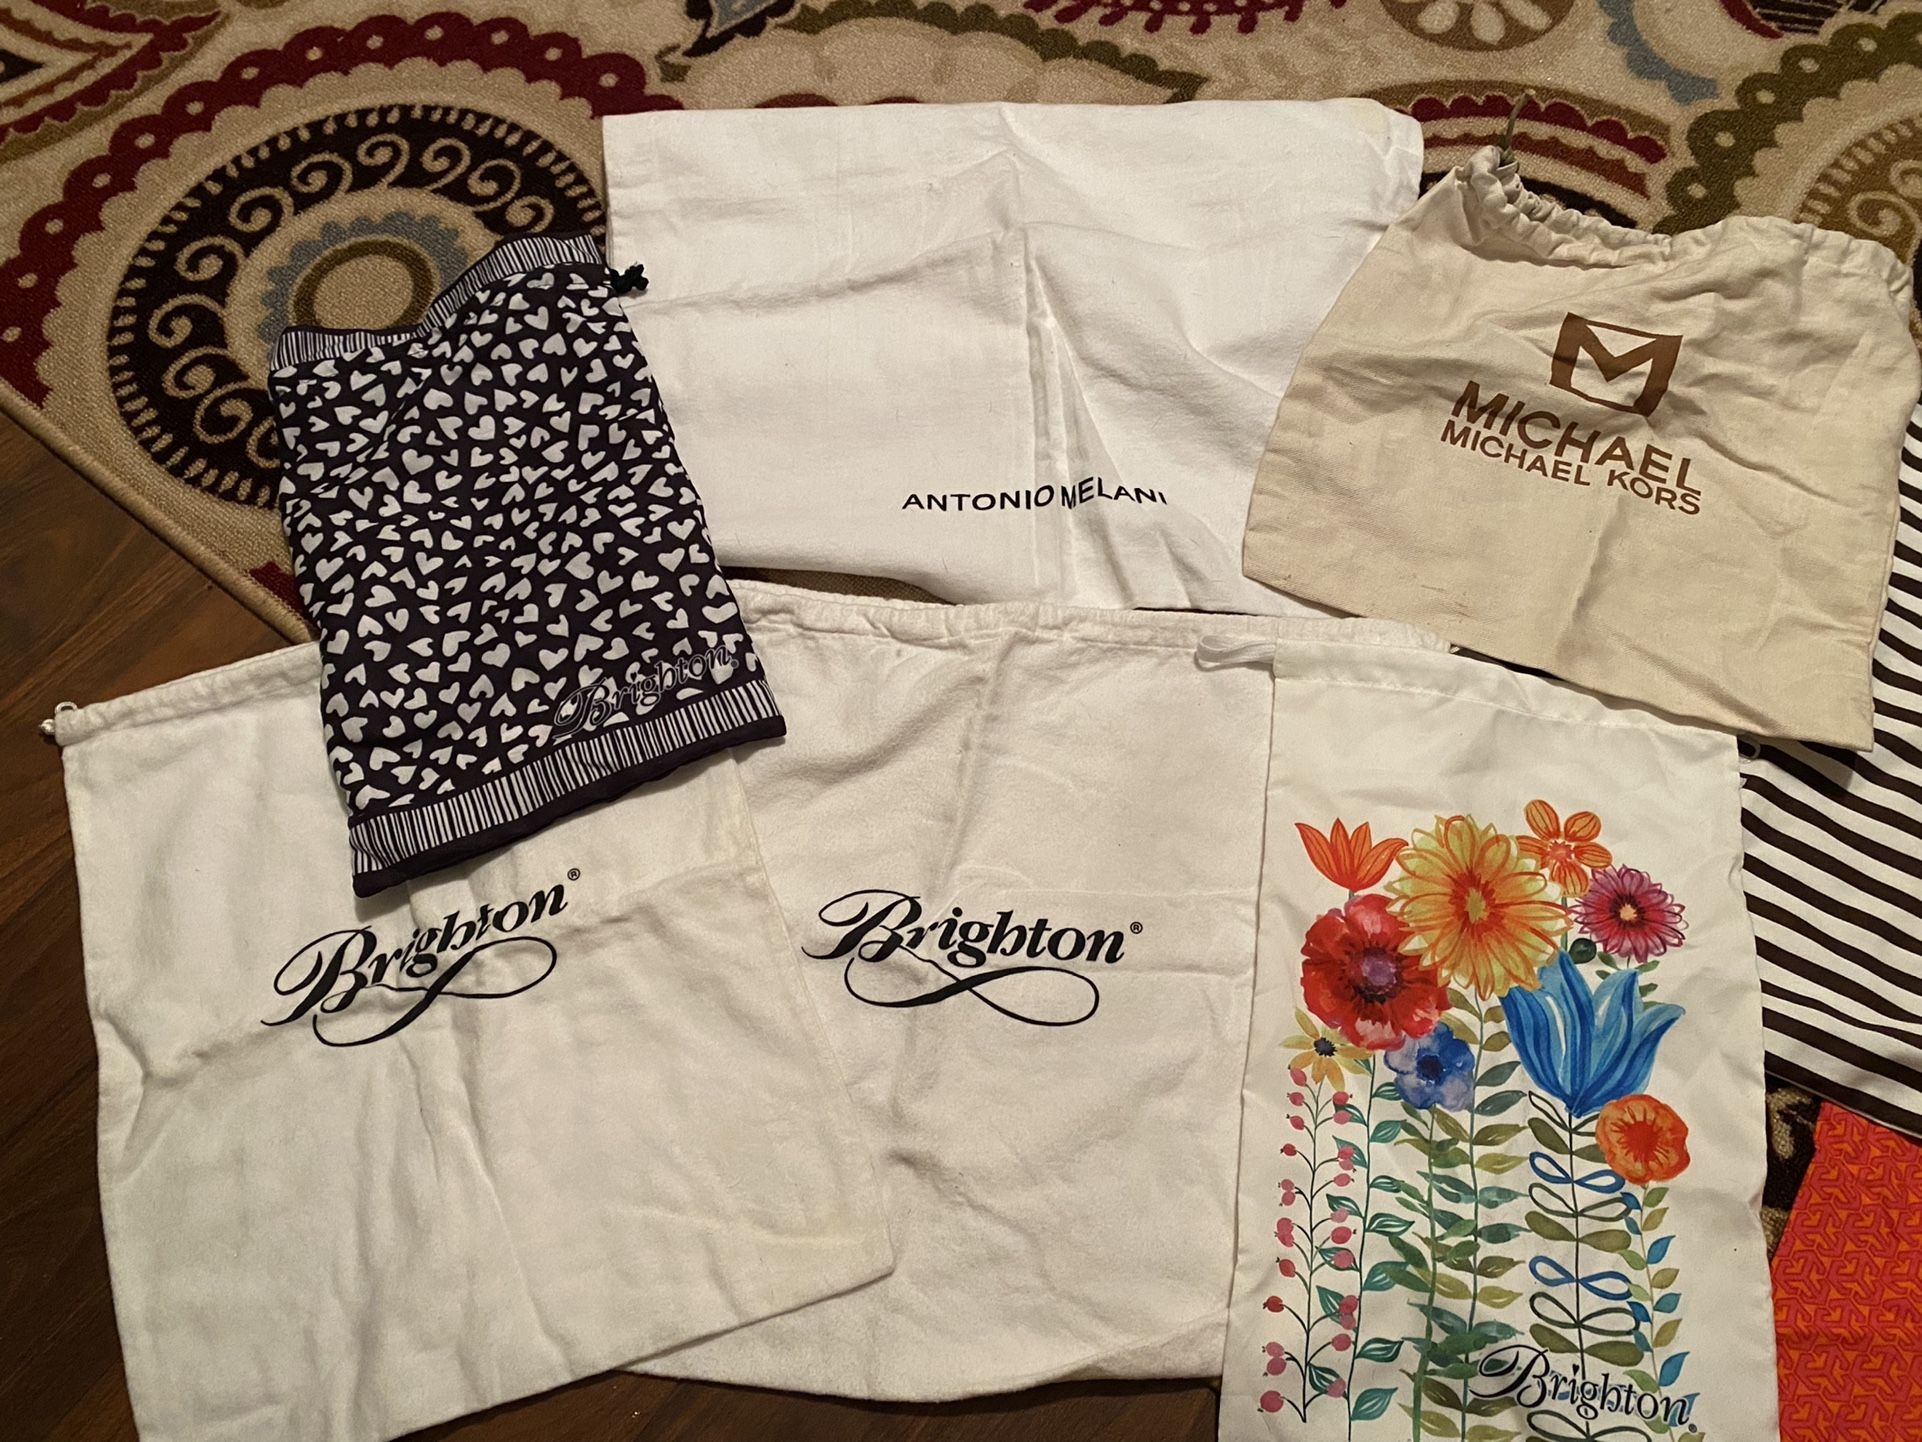 Brighton Chanel Patricia Nash Michael Kors etc. Dust  bags